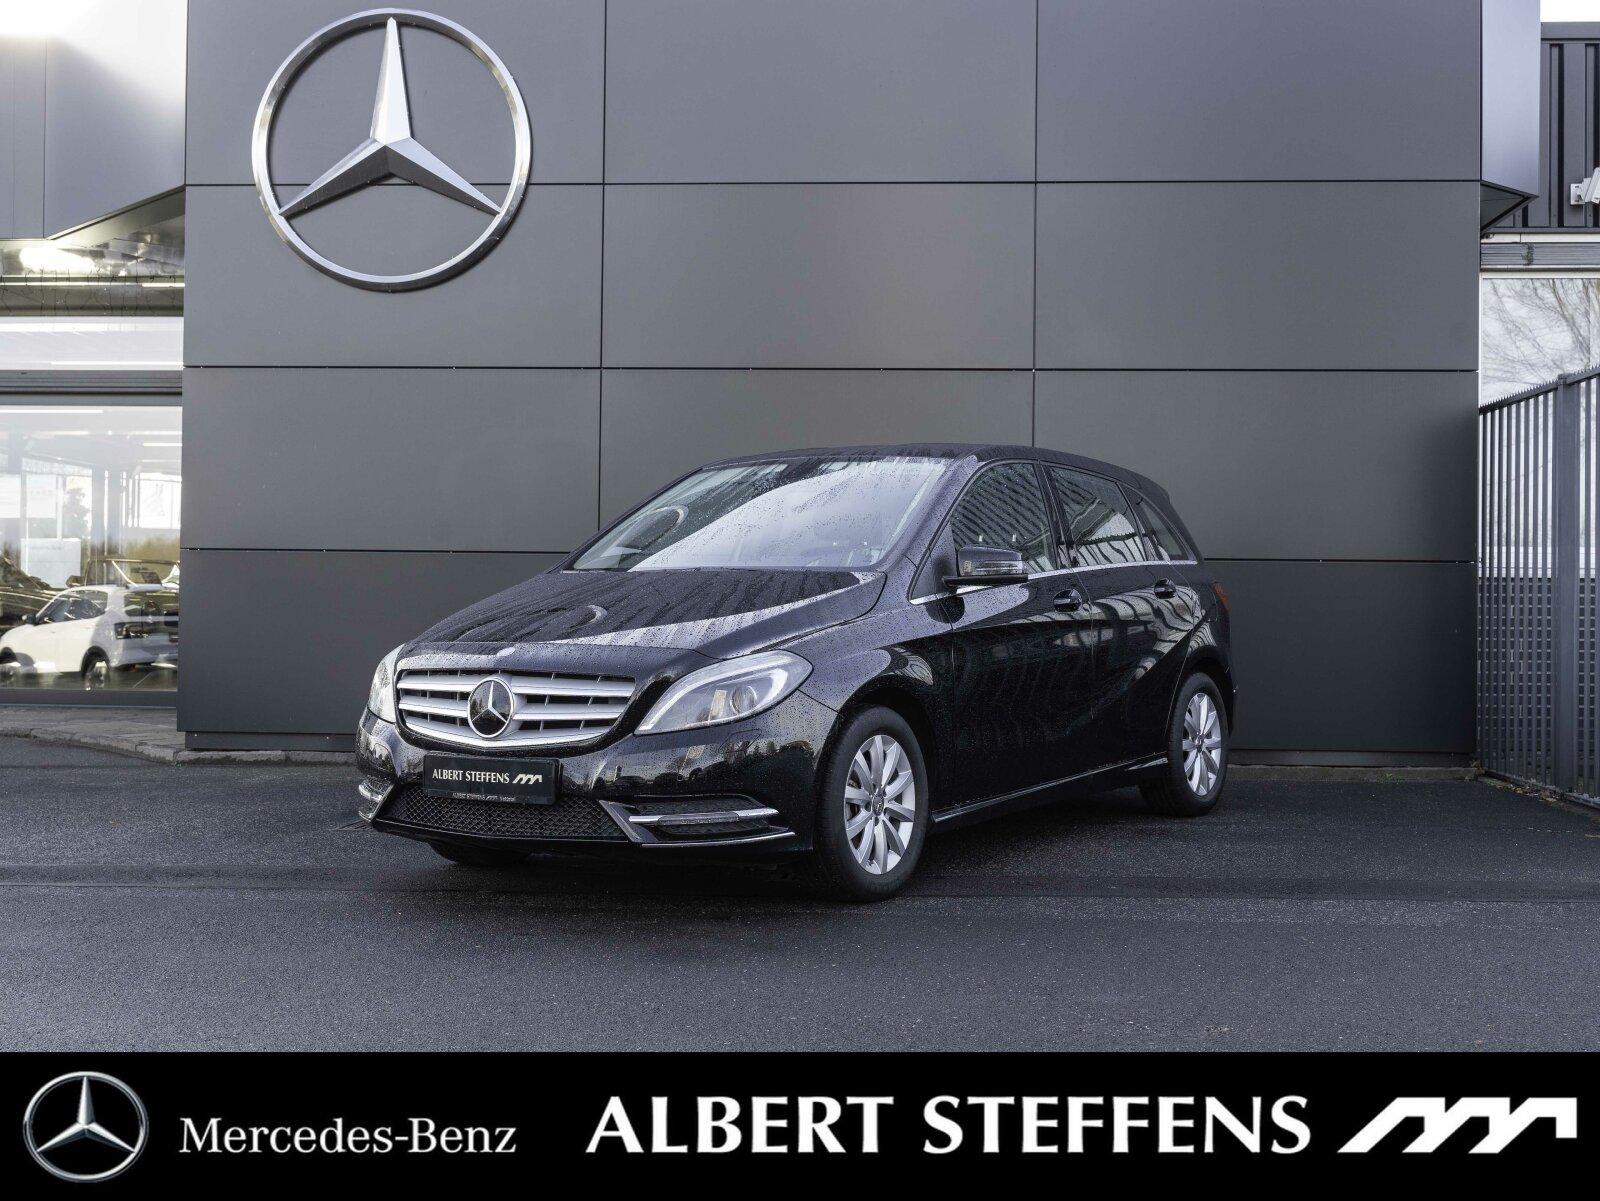 Mercedes-Benz B 180 Xenon+NAVI+AHK+Sitzheizung+Bremsassistent, Jahr 2014, Benzin